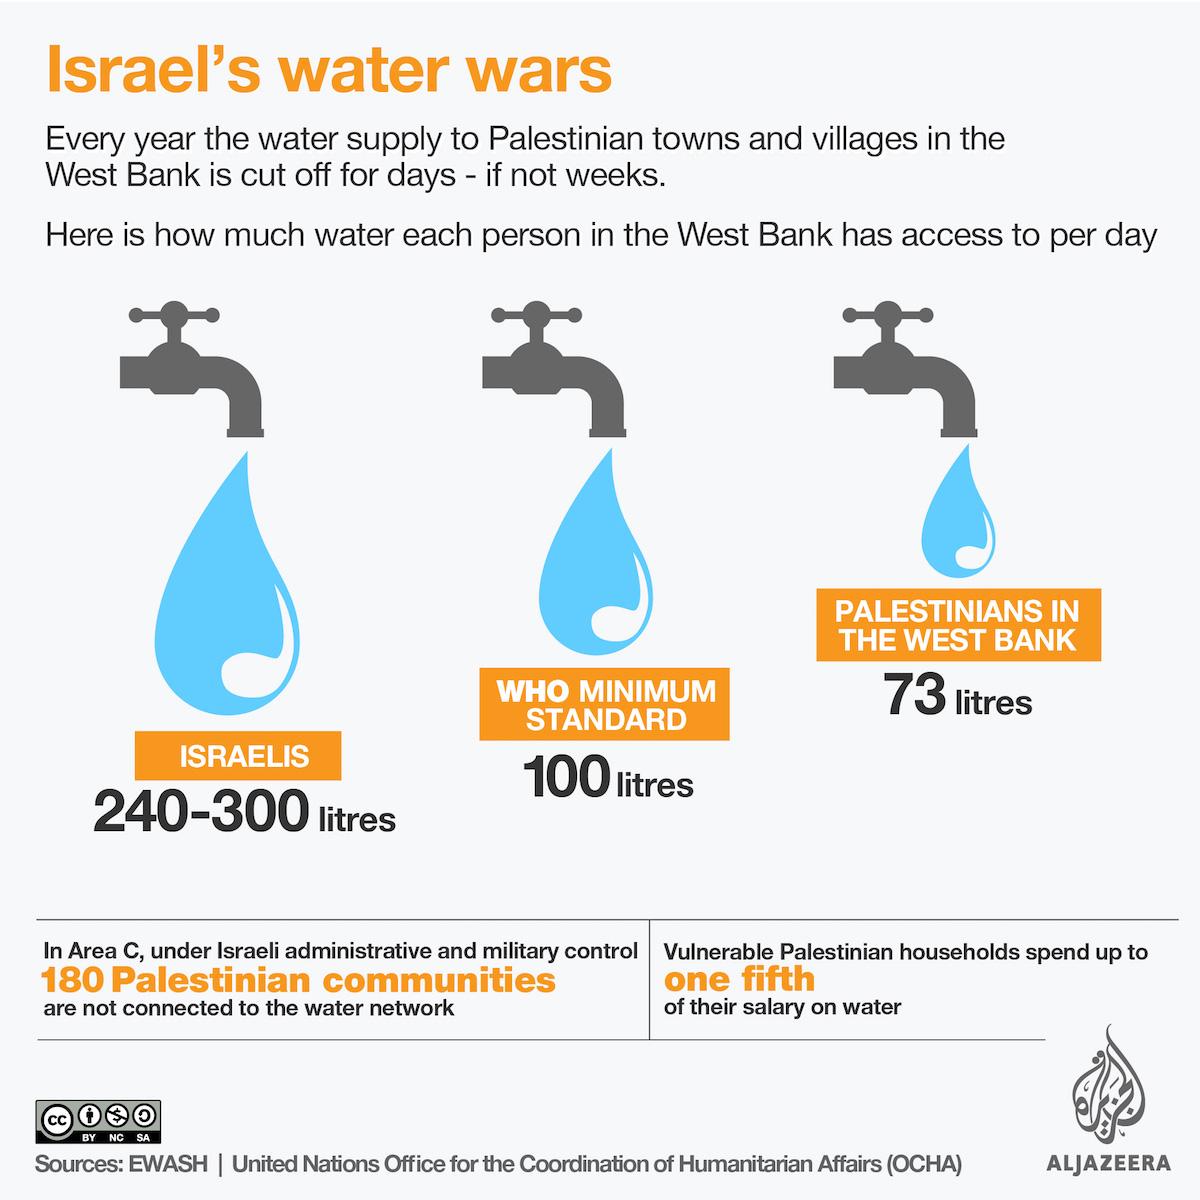 Israel Potong Air, Warga Palestina Kekeringan di Atas Sumber Air